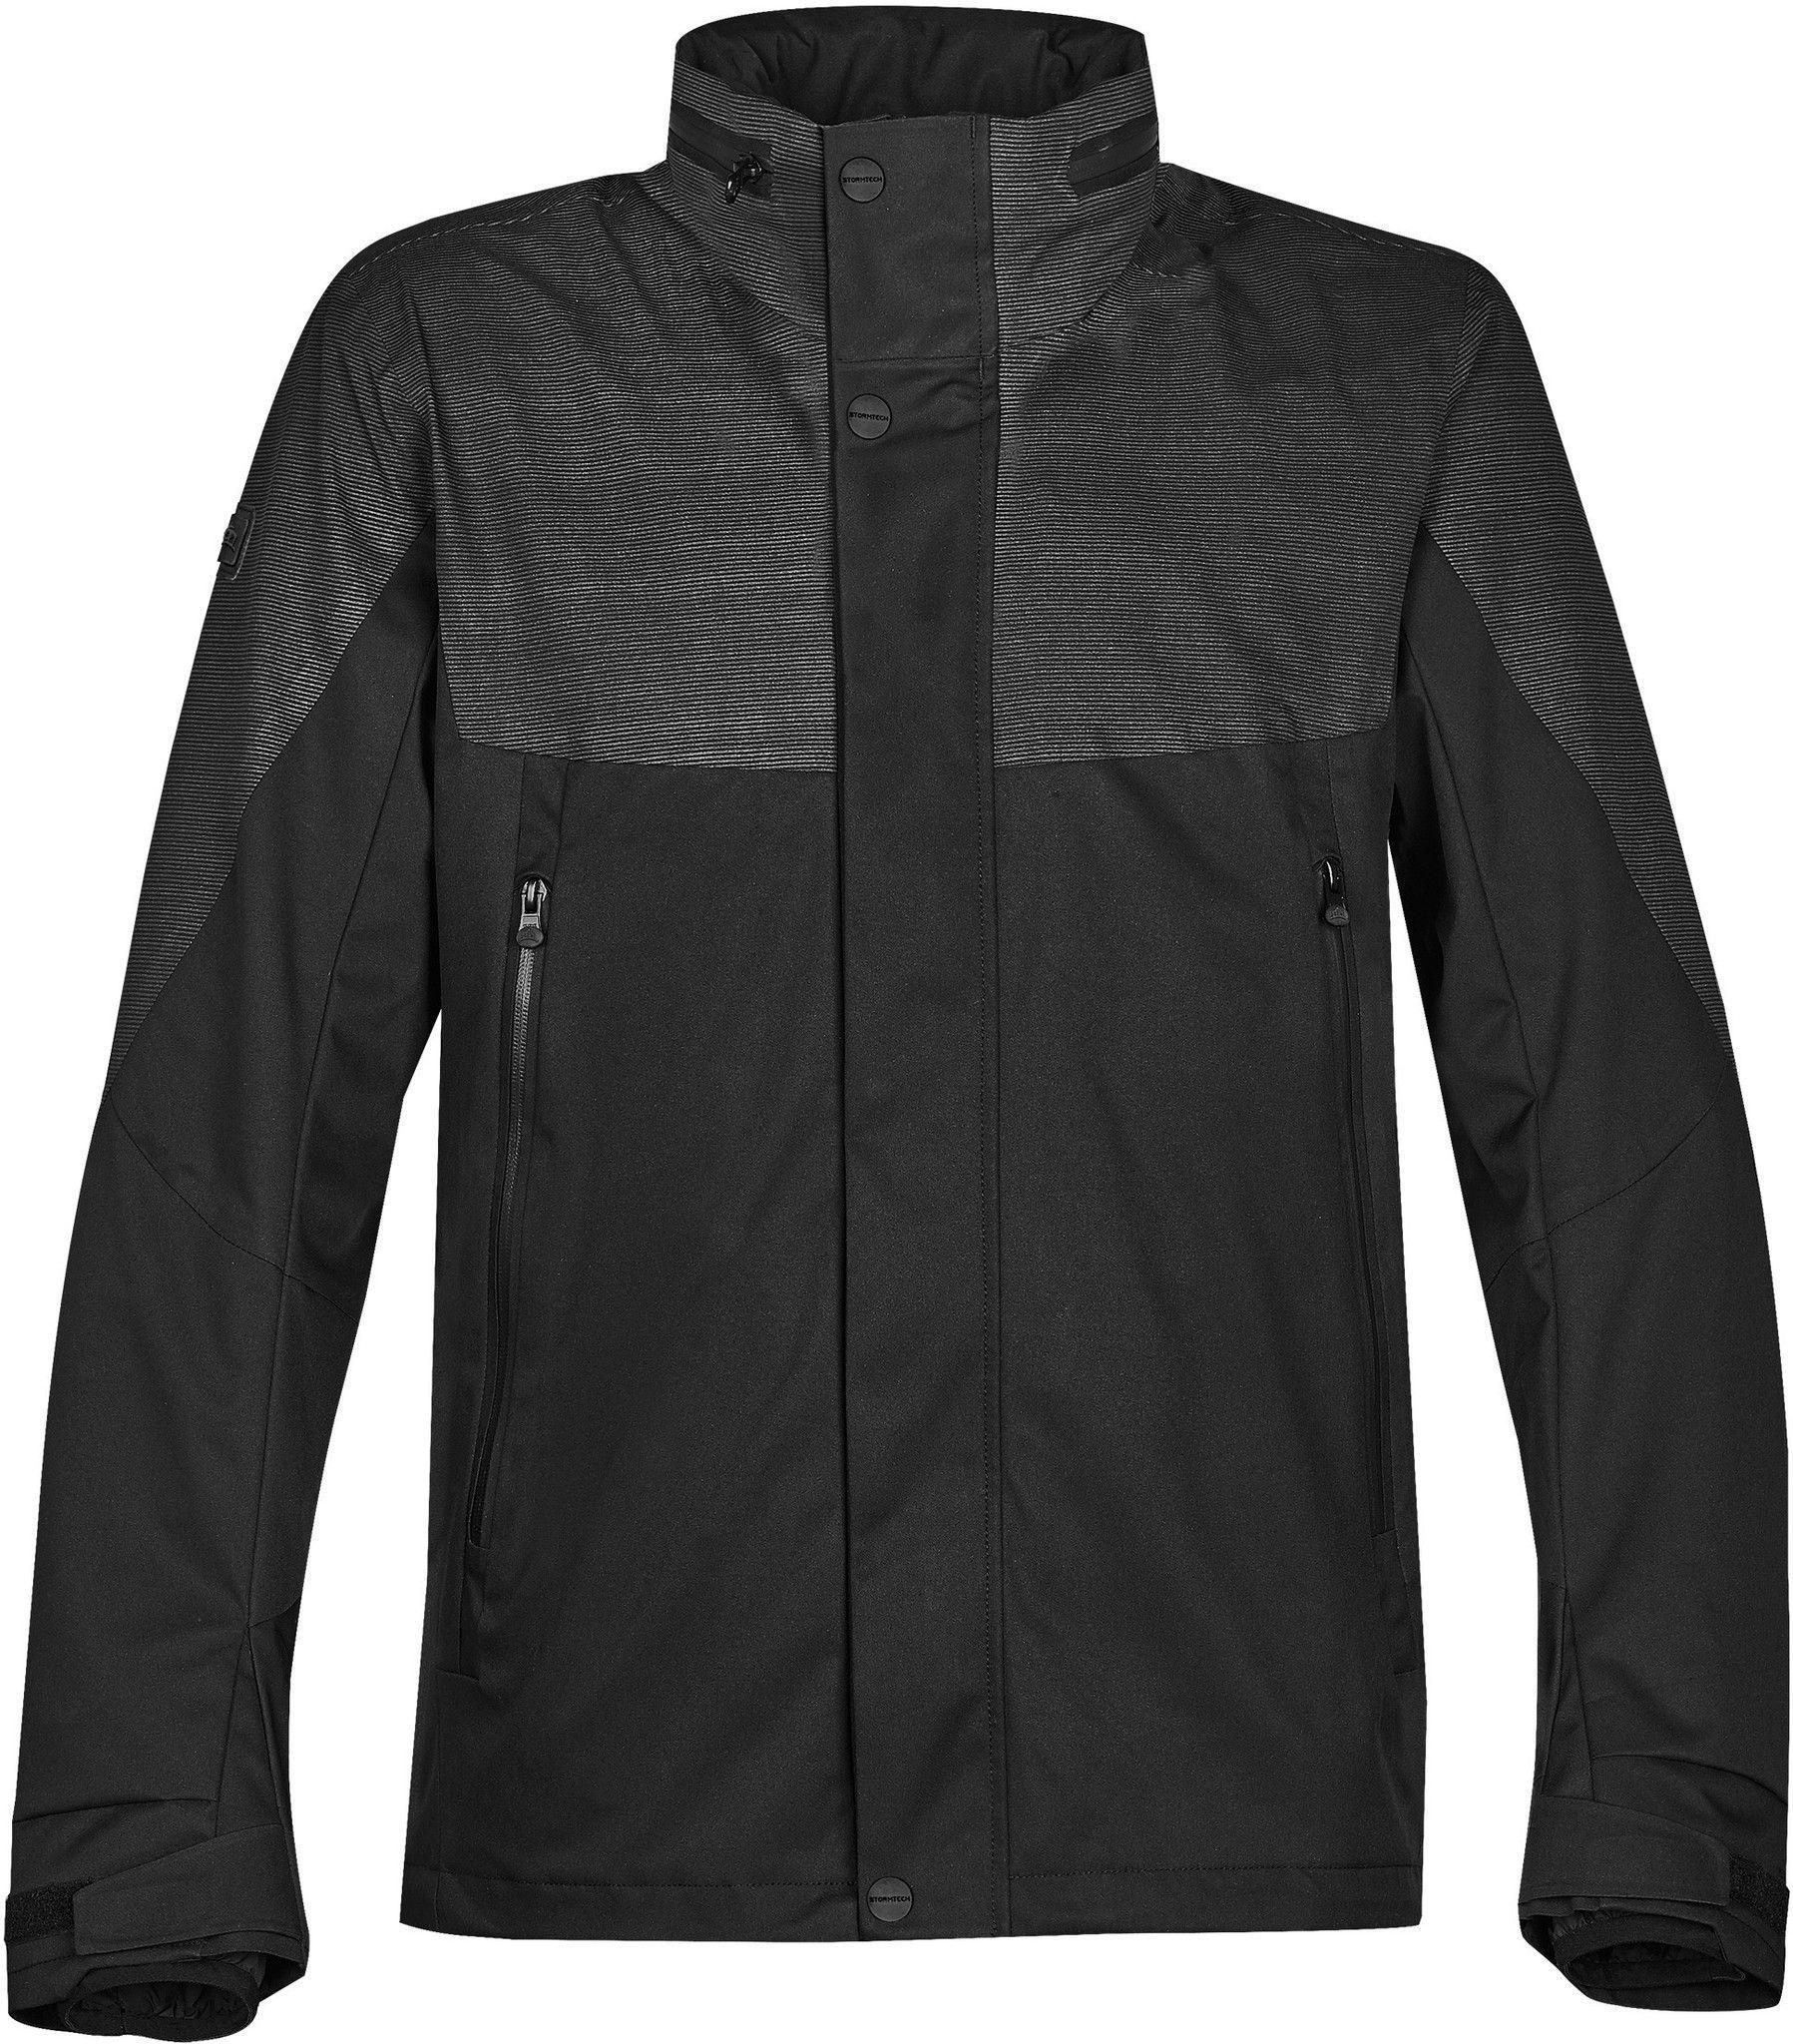 8a06d7690 RFX-2 Stormtech Men's Stealth Explorer Jacket | Products | Jackets ...